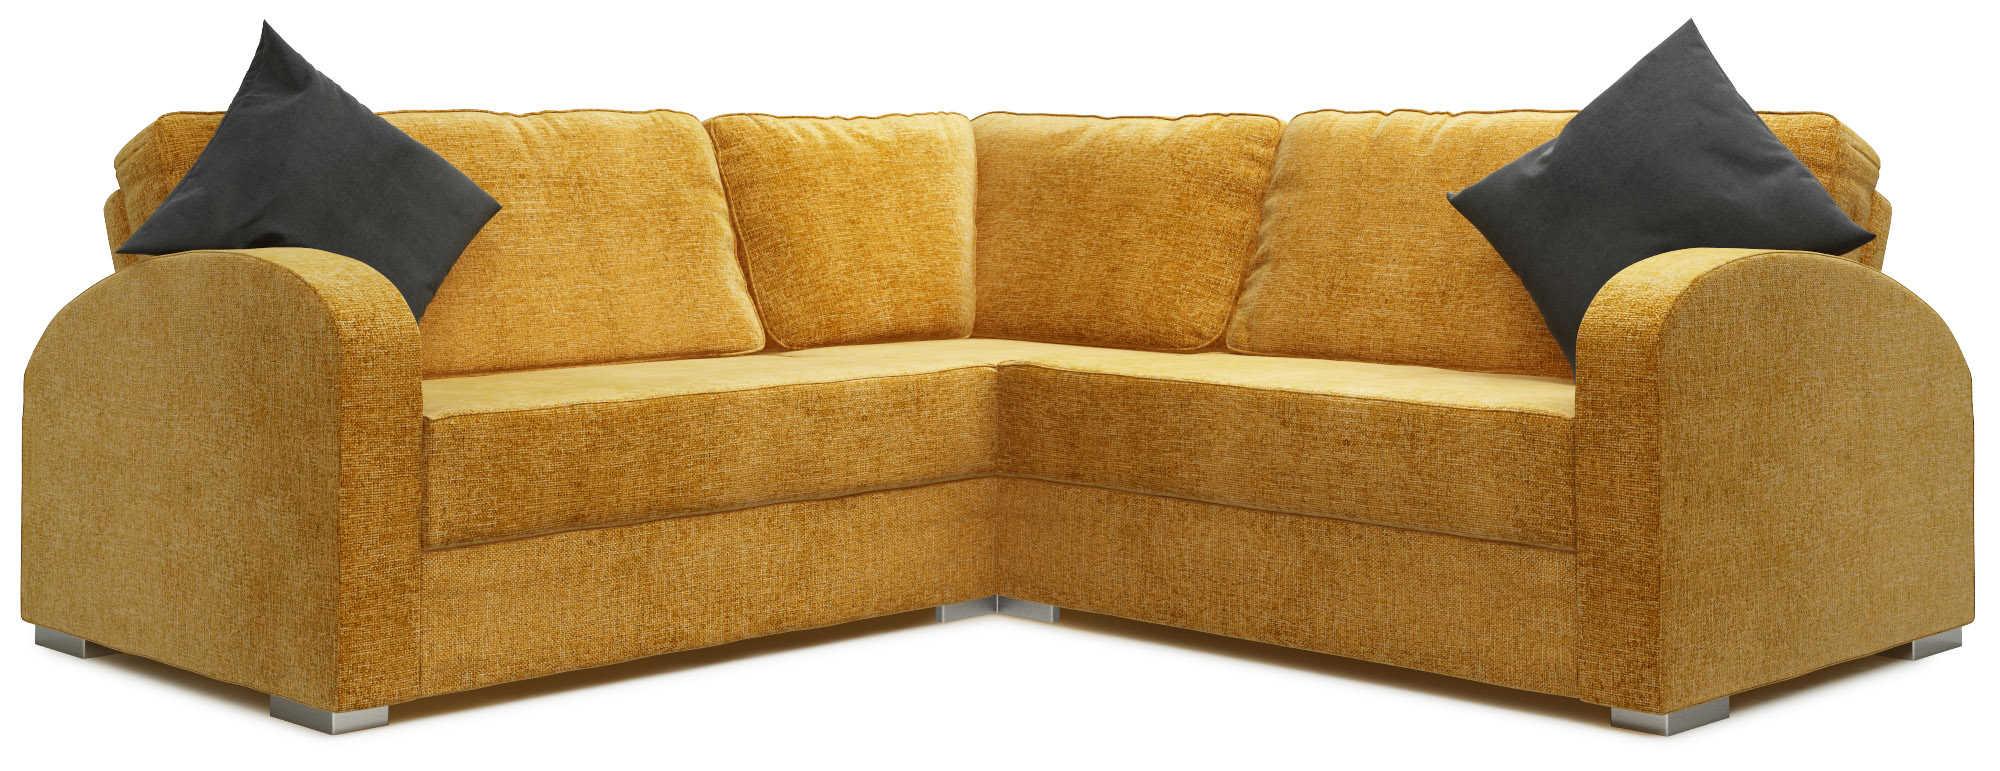 Xuxu 2X2 Corner Single Sofa Bed